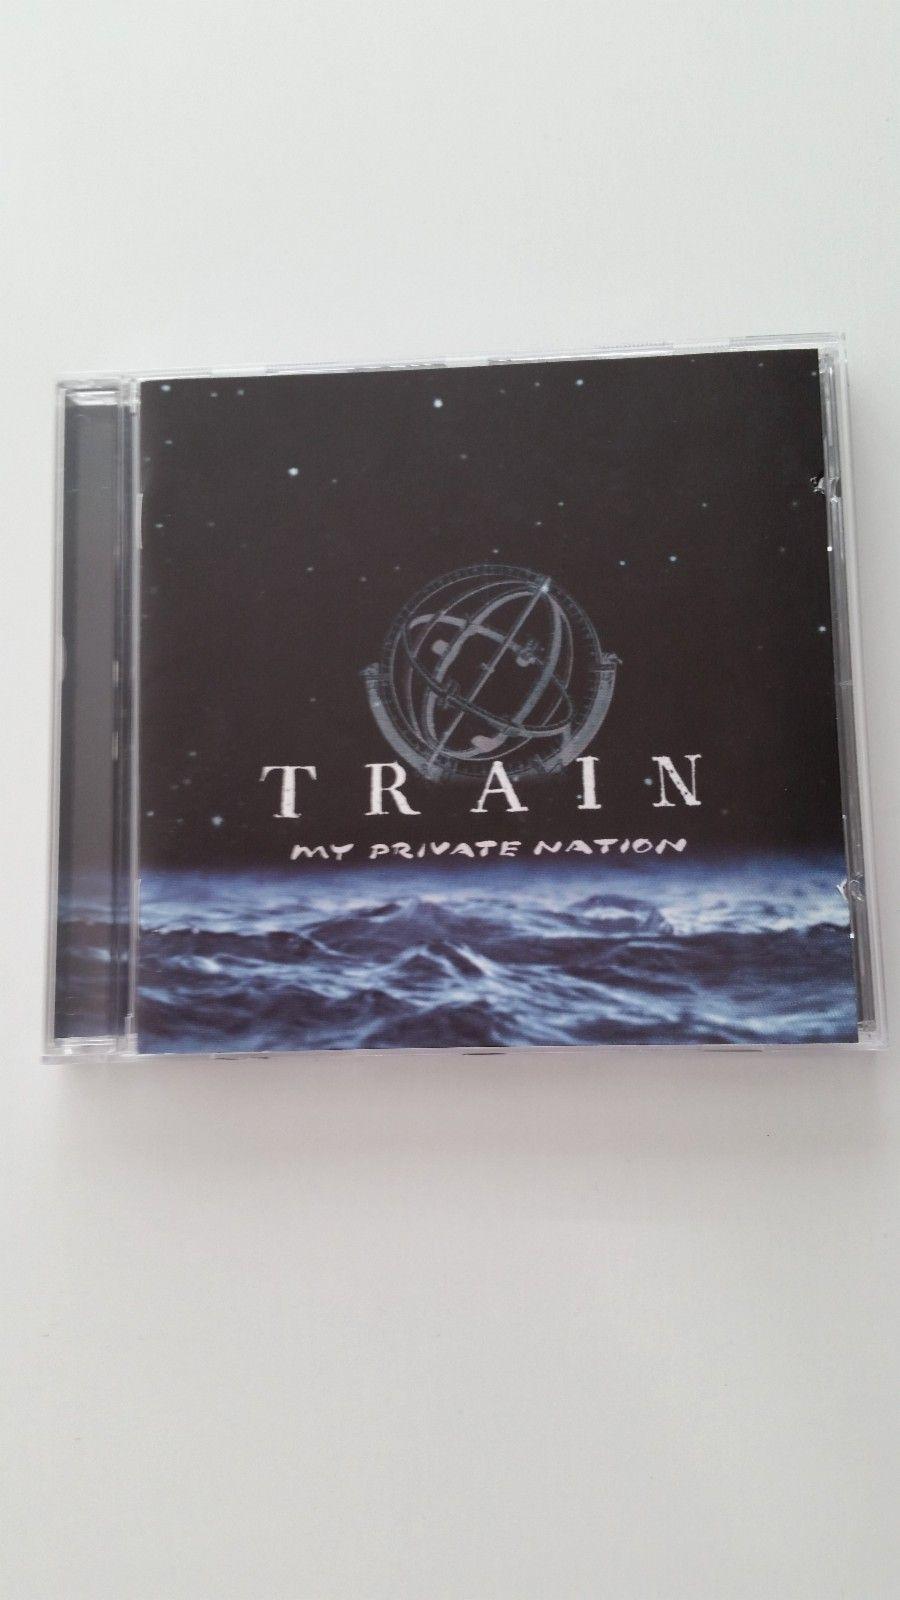 Train - My Private Nation  (CD) - Rypefjord  - Train - My Private Nation (CD) Media condition: Near Mint. Gratis frakt! - Rypefjord